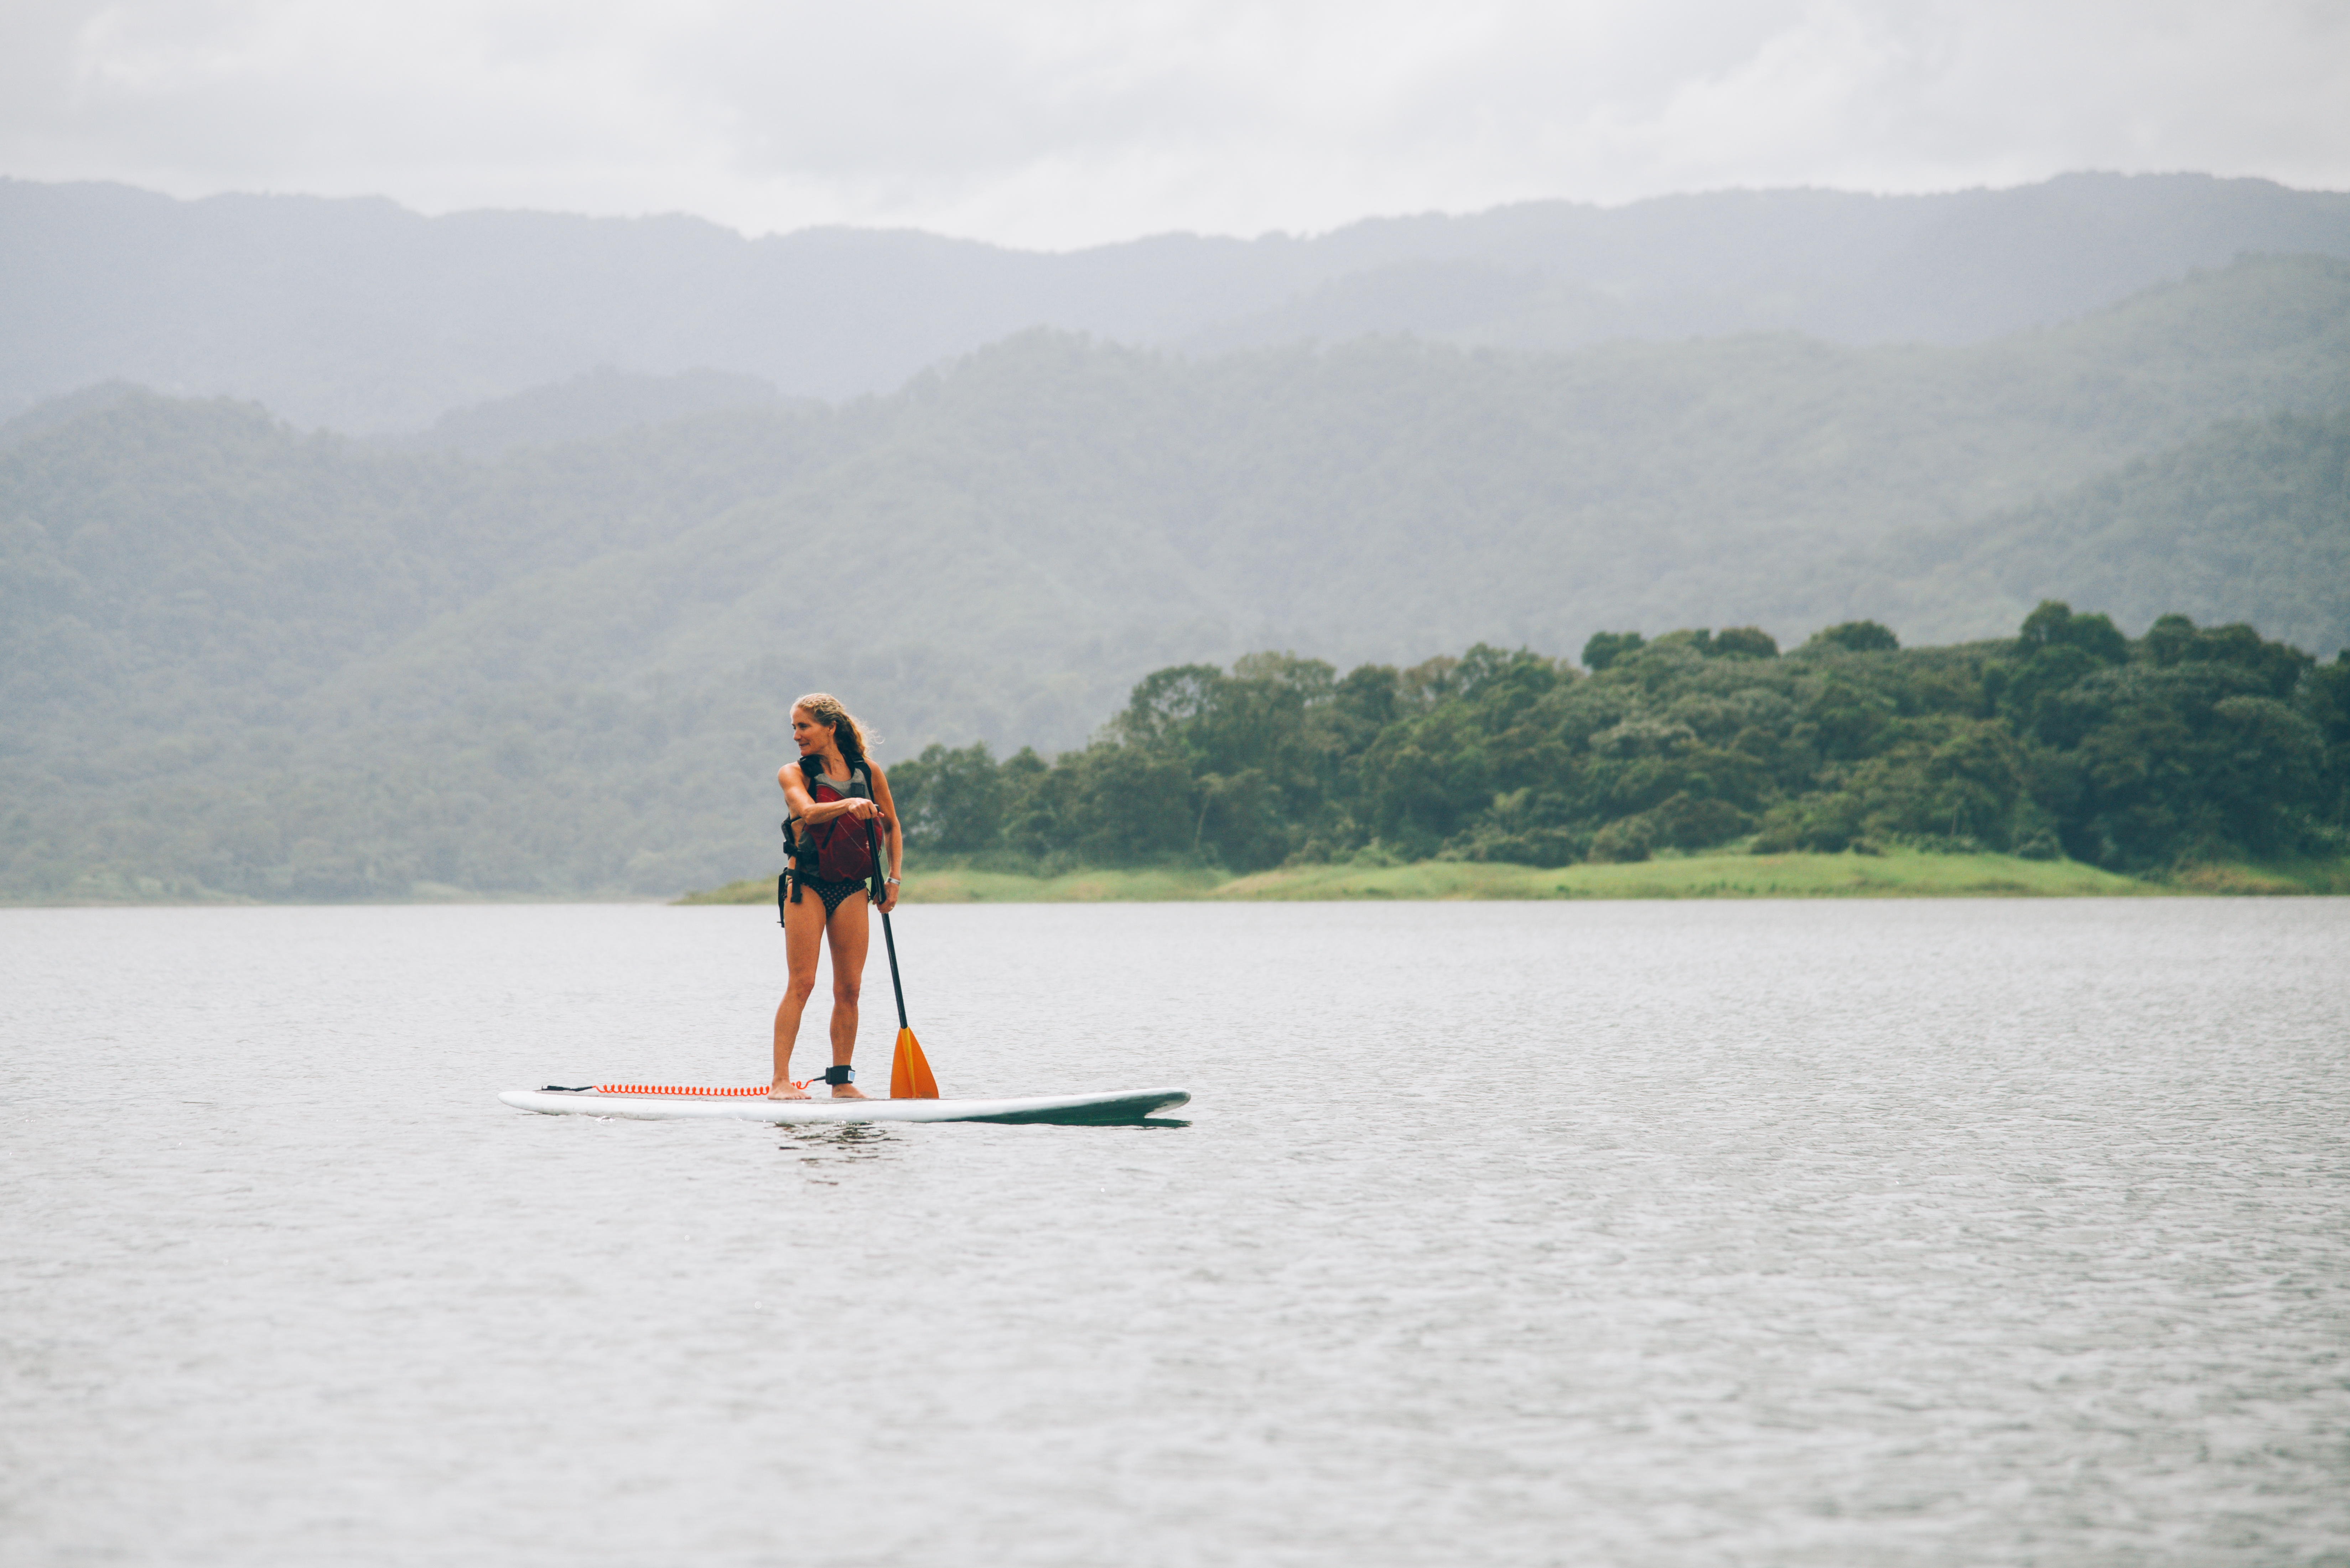 Walk on water! Costa Rica Vacation! Enjoying Nature!